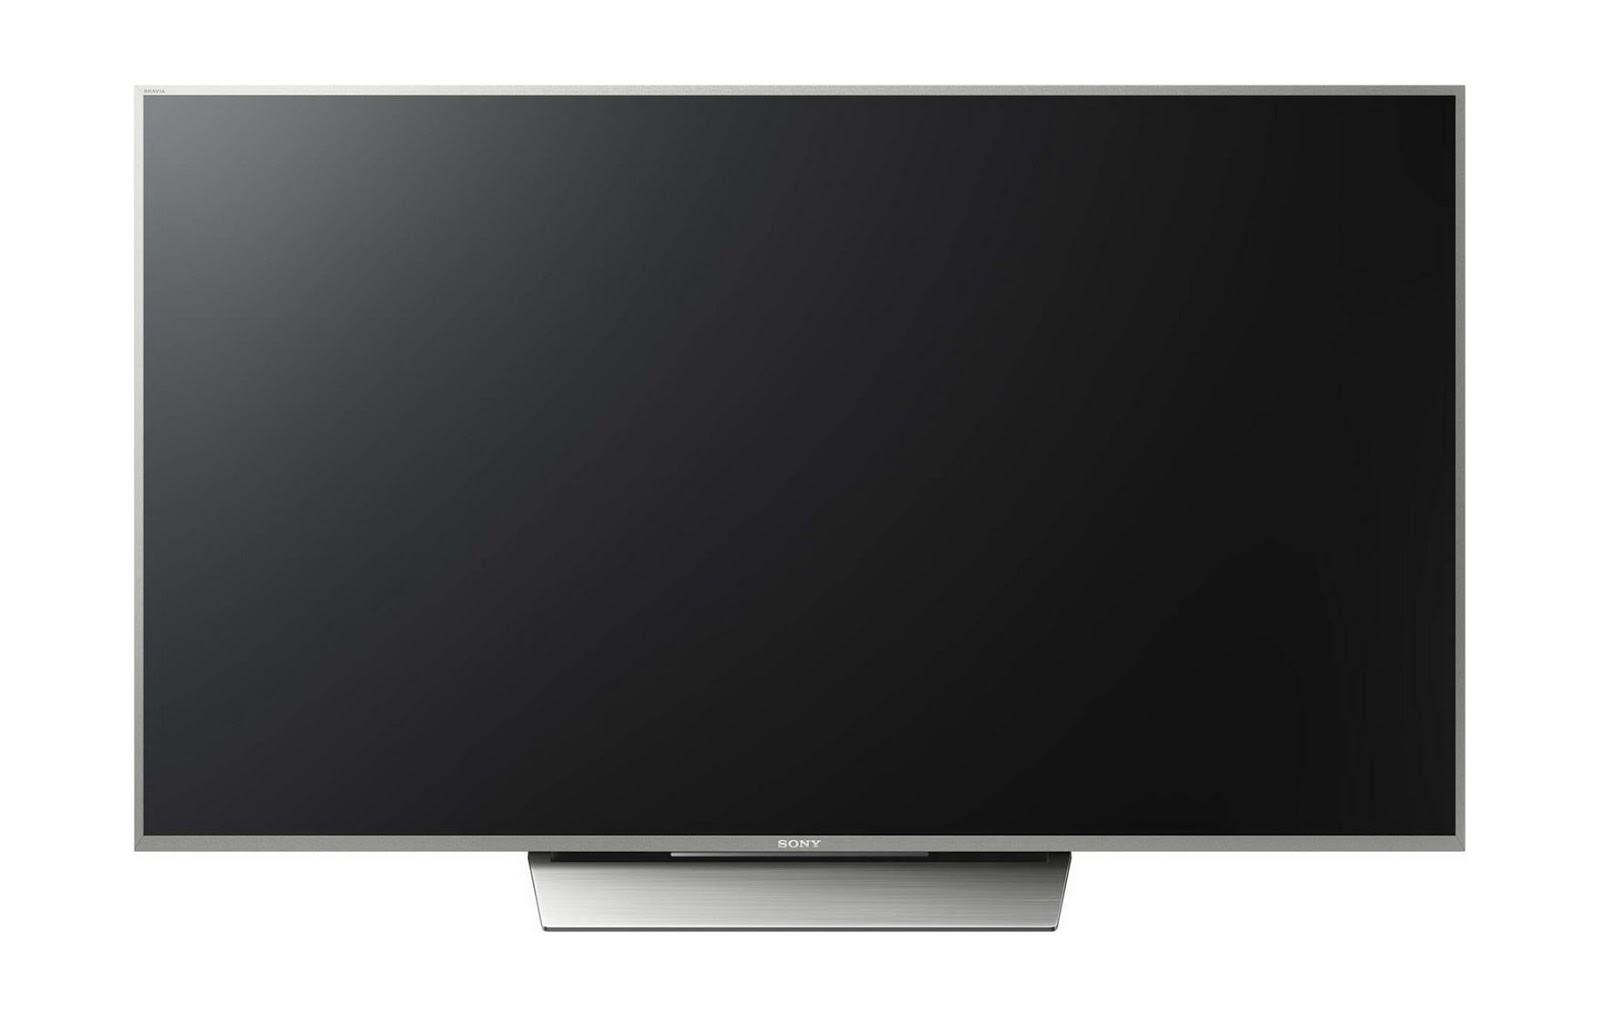 شاشات وتلفزيونات سوني Sony في عمان